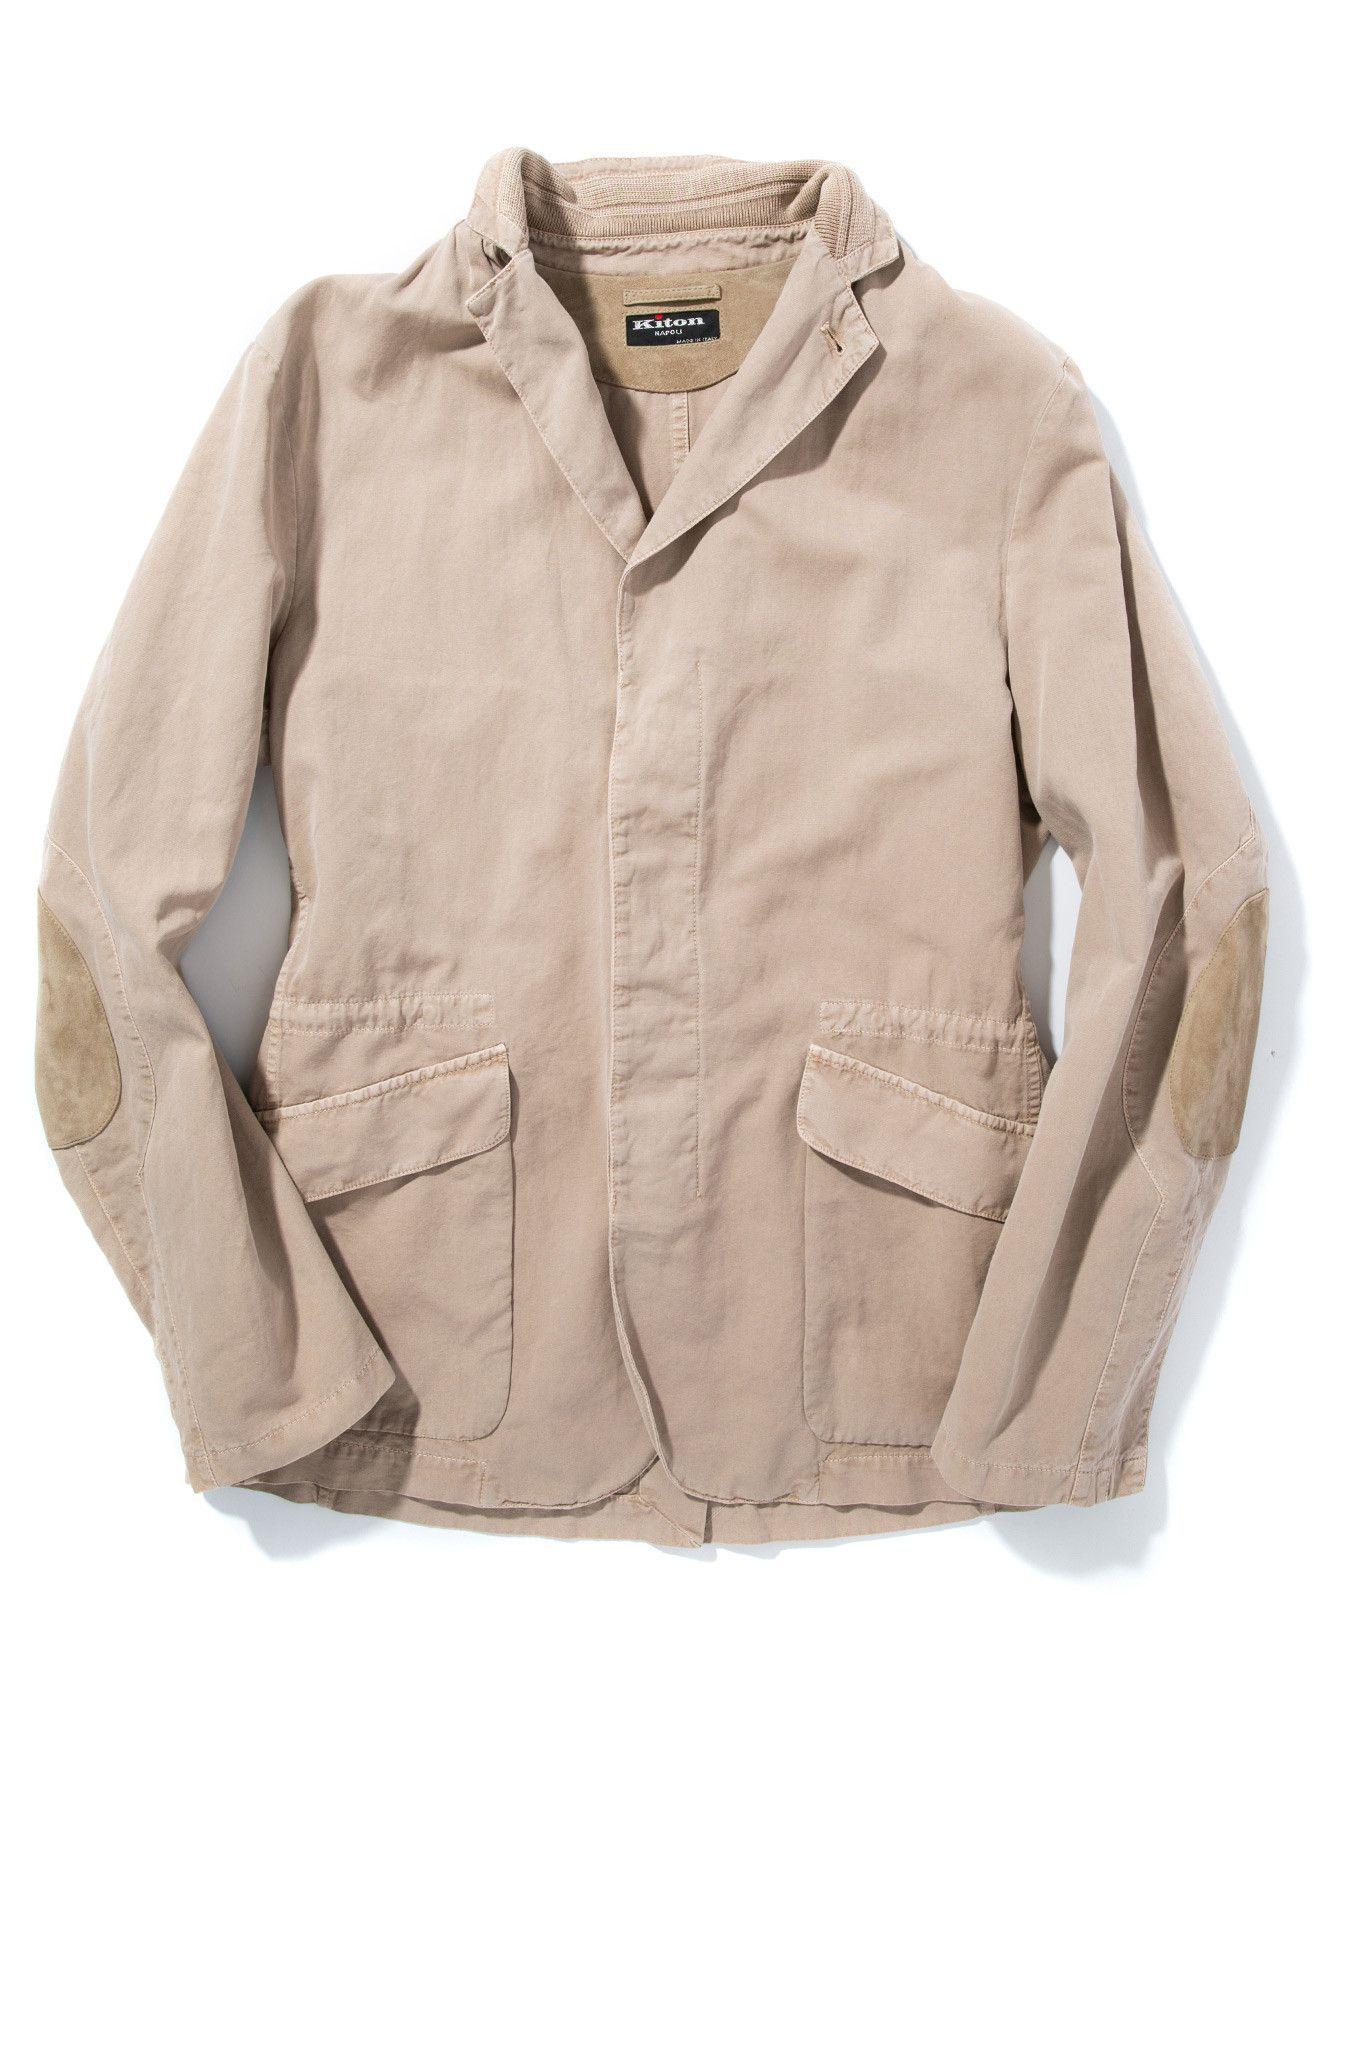 Kiton Murcia Tan Canvas Jacket Products # Muebles Dous Murcia